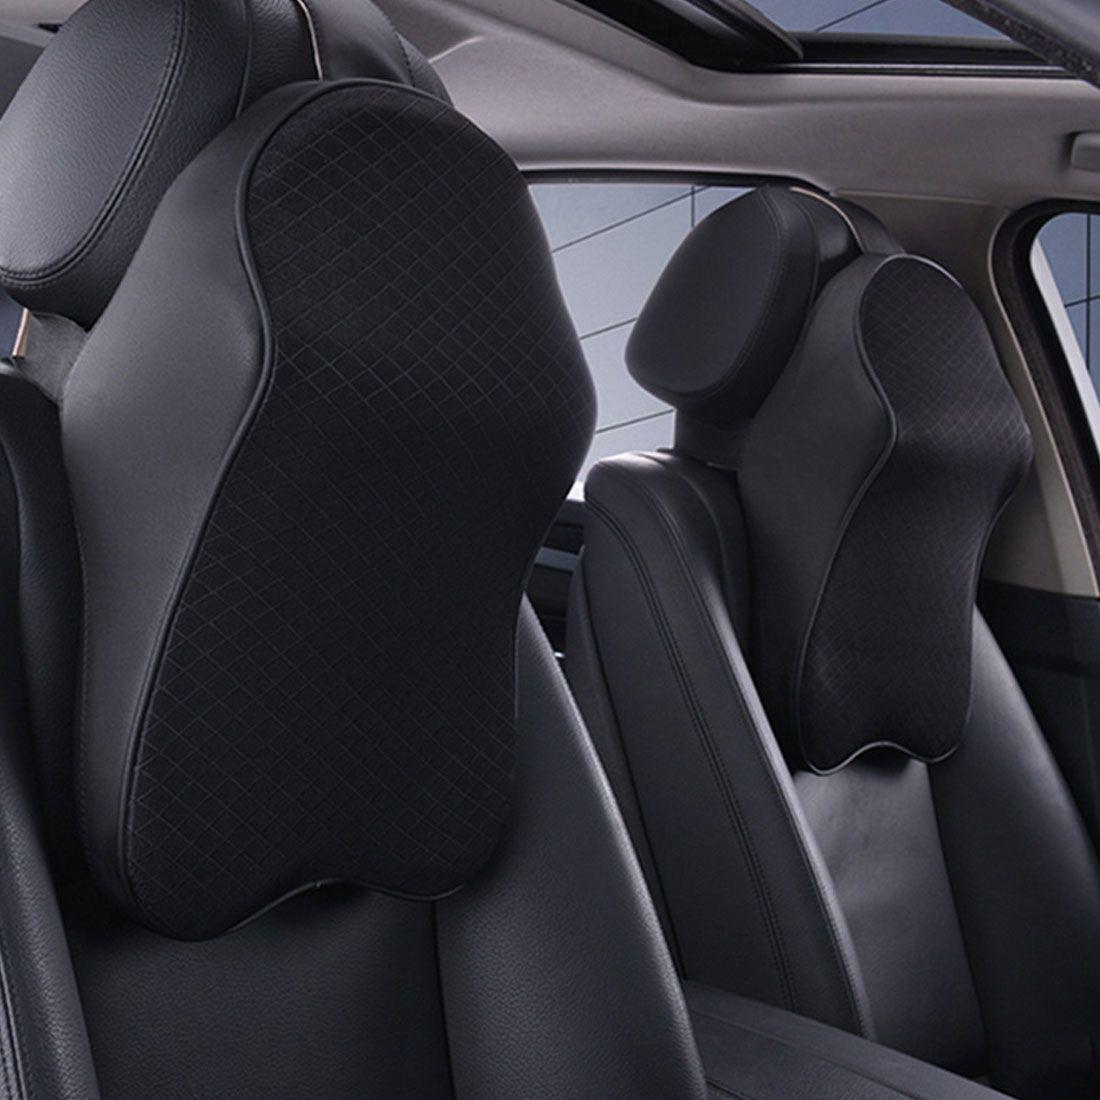 Dewtreetali New Auto 3D Space Memory Foam Car Leather Neck Pillow Head Restraint Car Headrest Pillow Car Styling